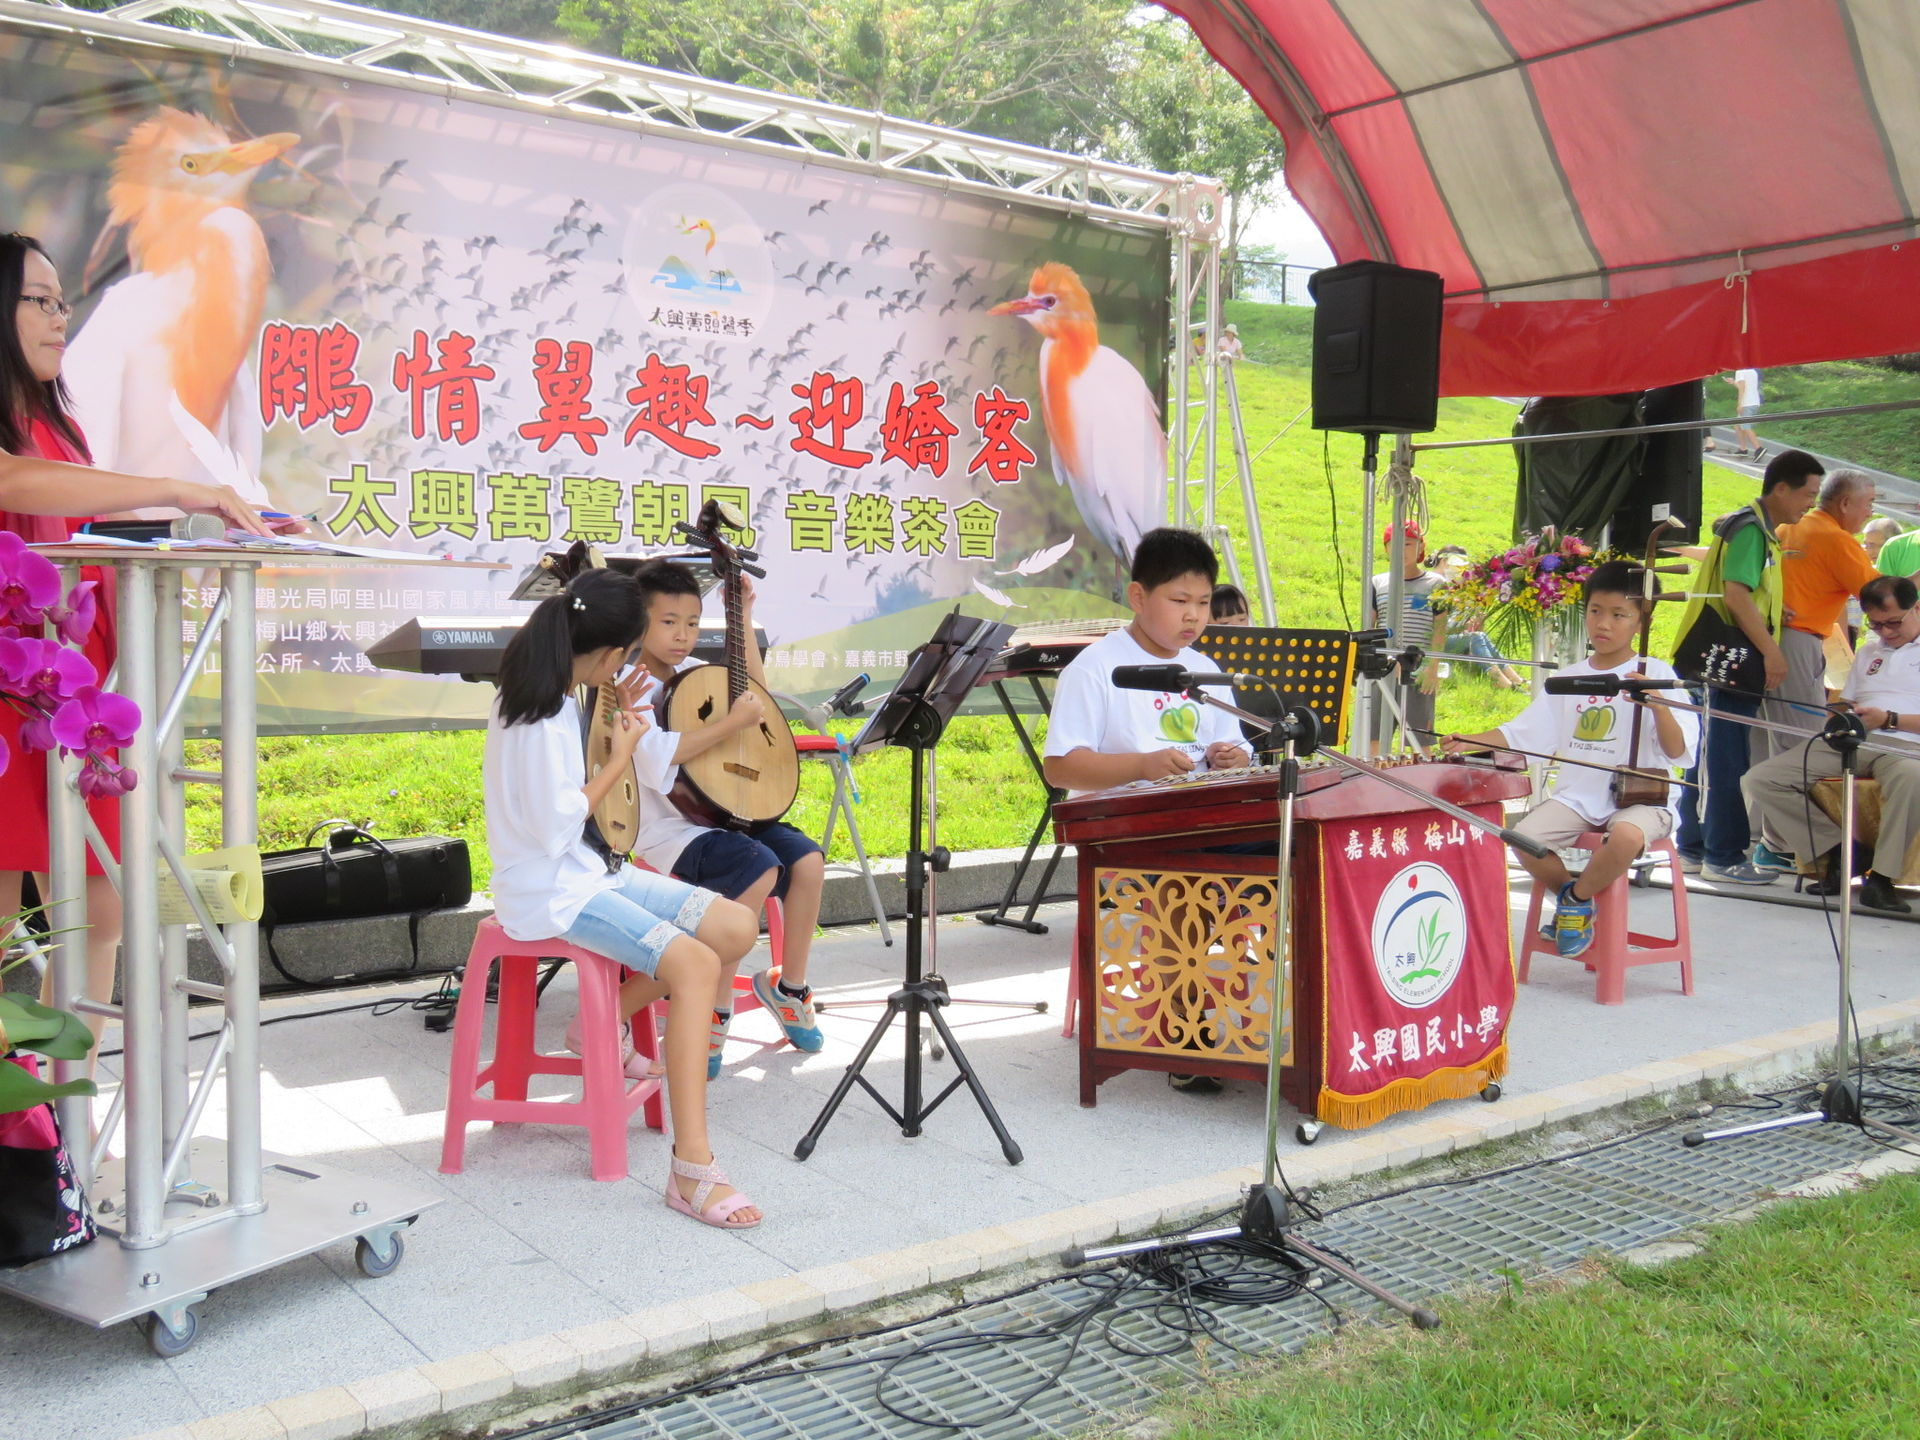 http://www.tses.cyc.edu.tw/uploads/tadgallery/2017_09_09/3964_社區生態音樂季表演.JPG